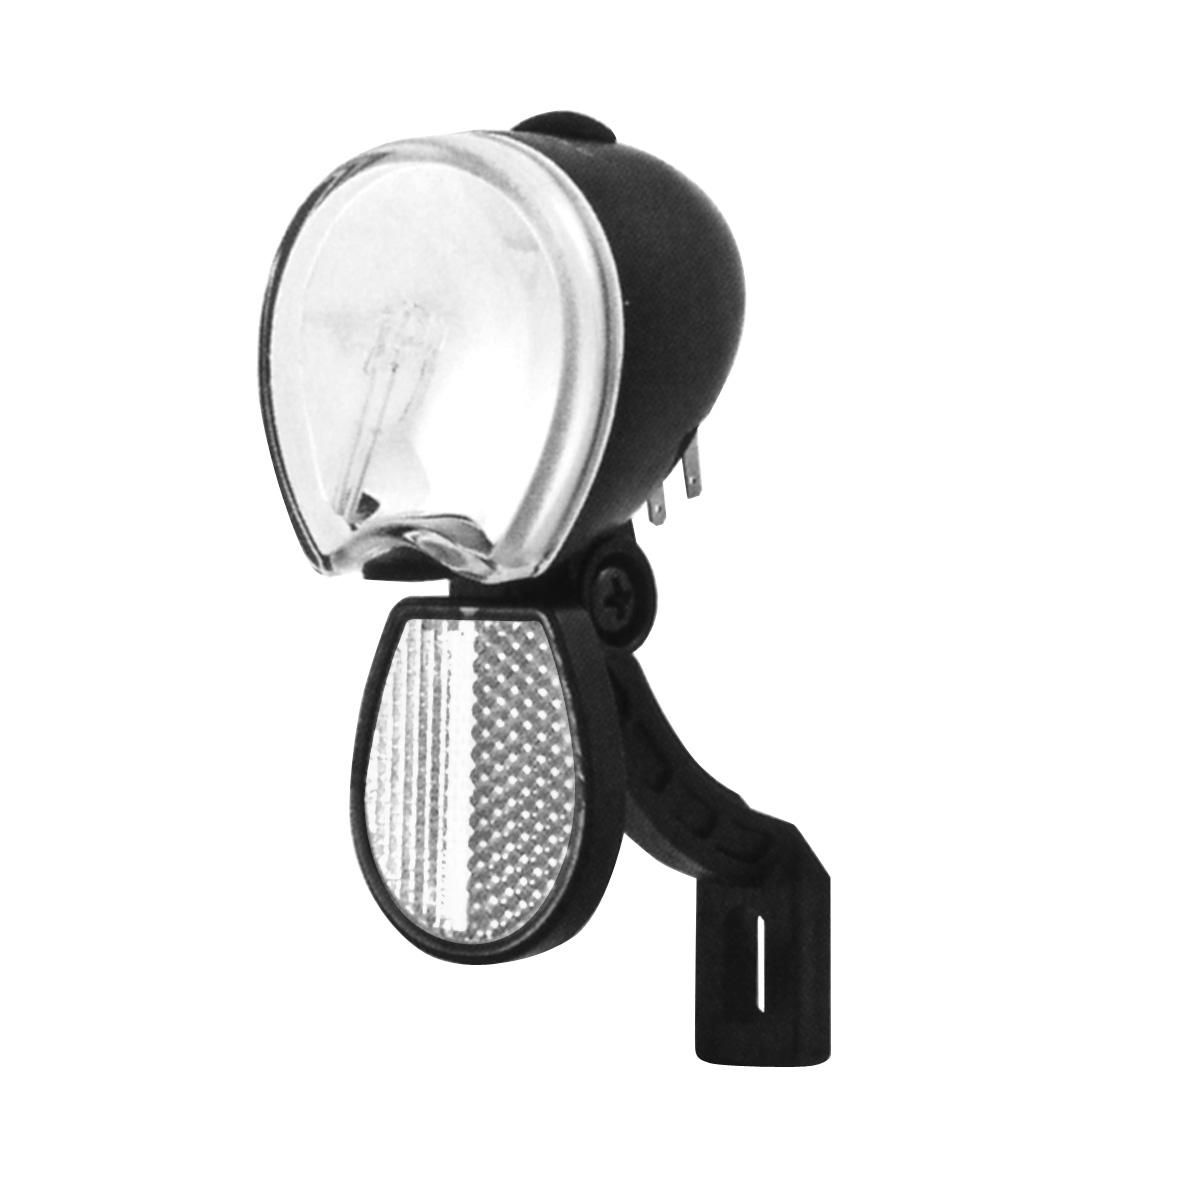 Éclairage avant Spanninga Micro Ff Xdo 1 LED 10 Lux (Dynamo et moyeu dynamo)